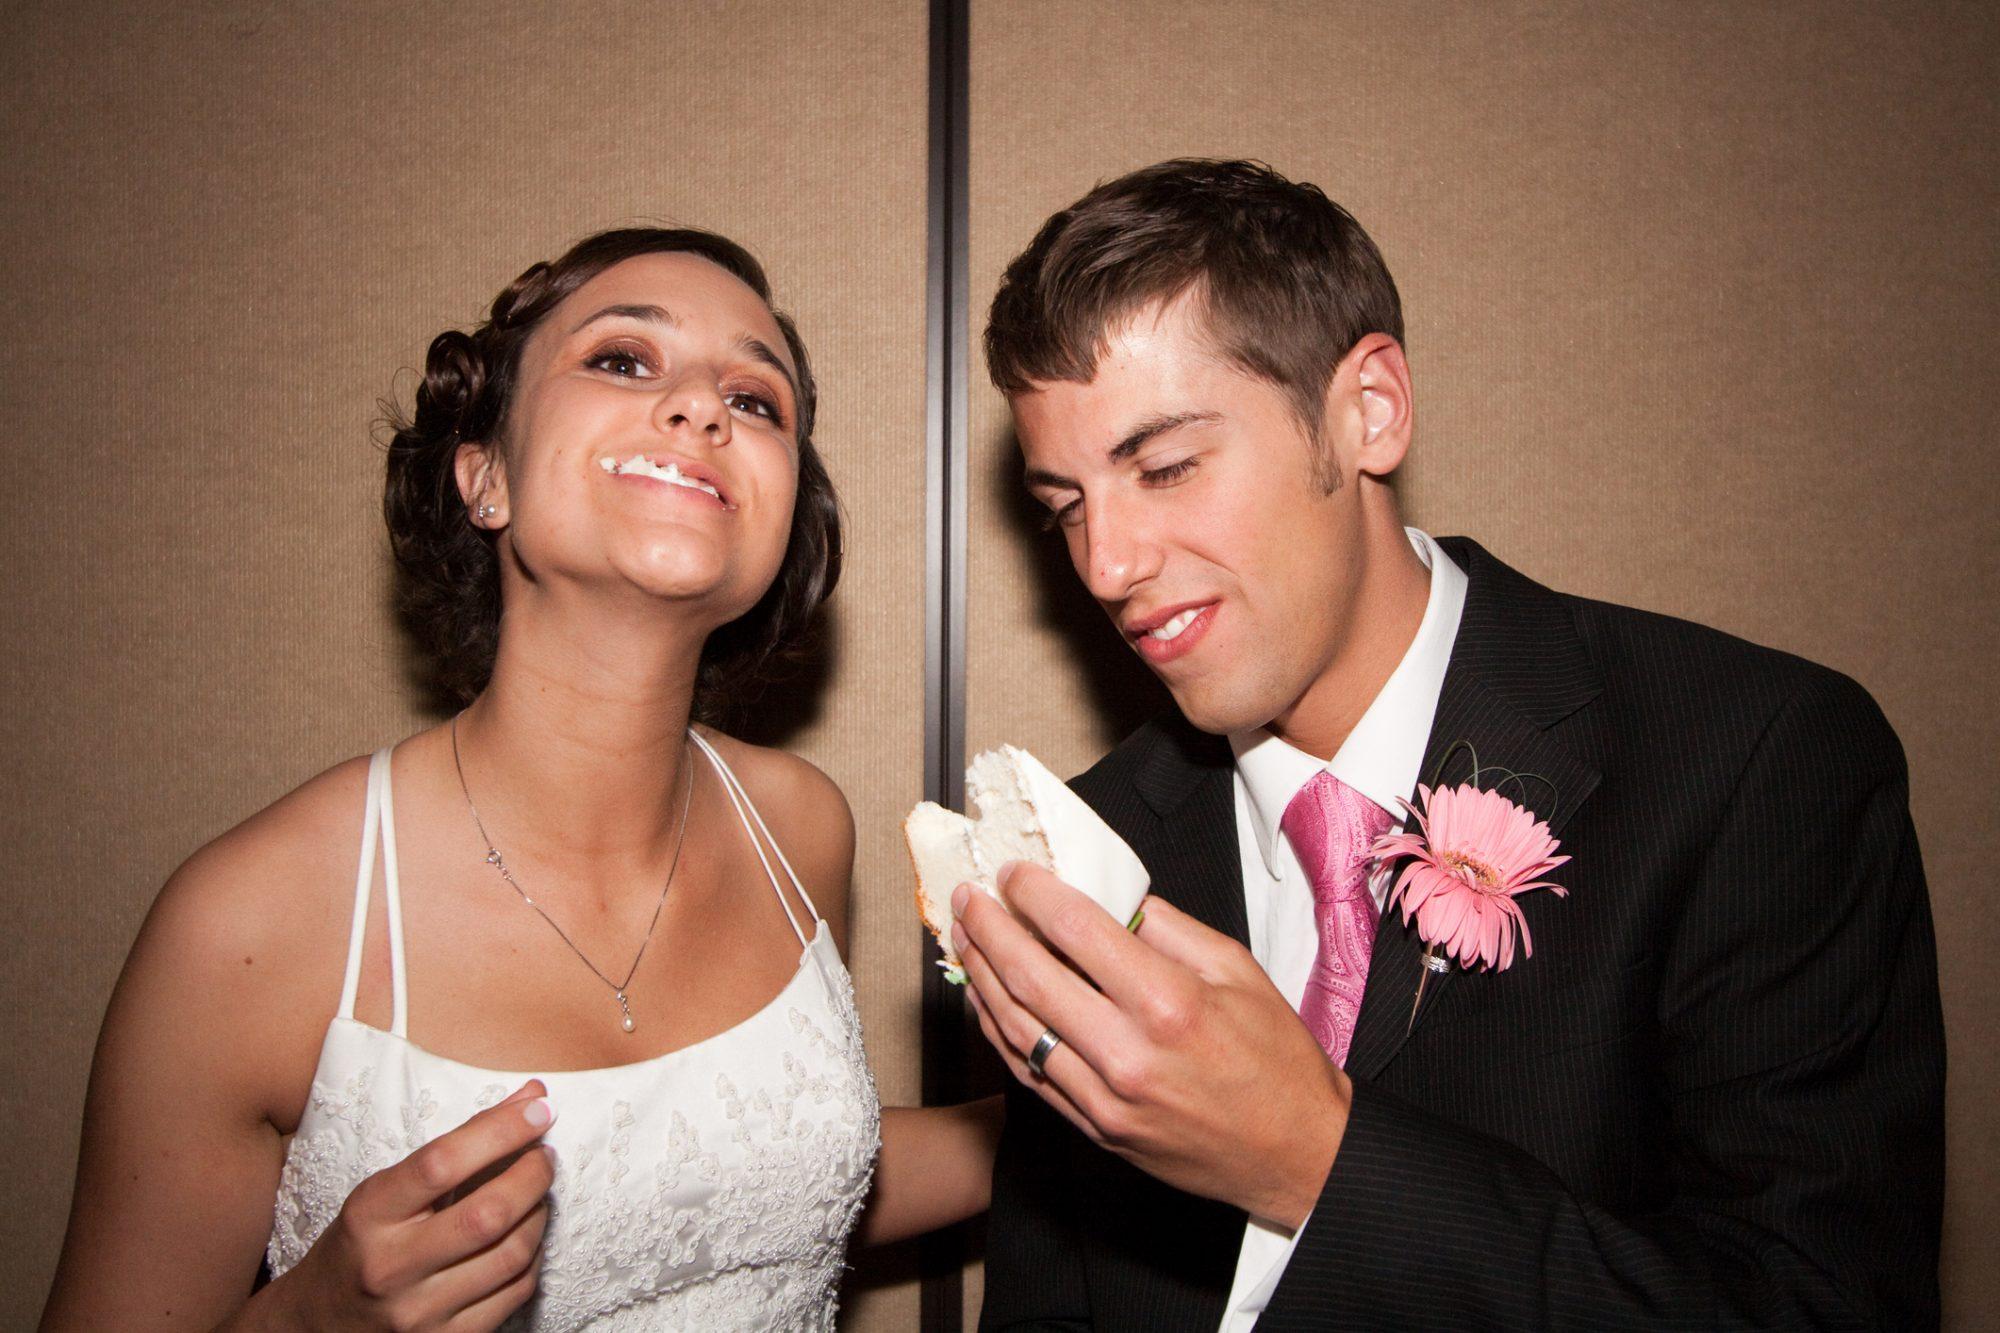 Newlyweds take bites of cake at a wedding reception